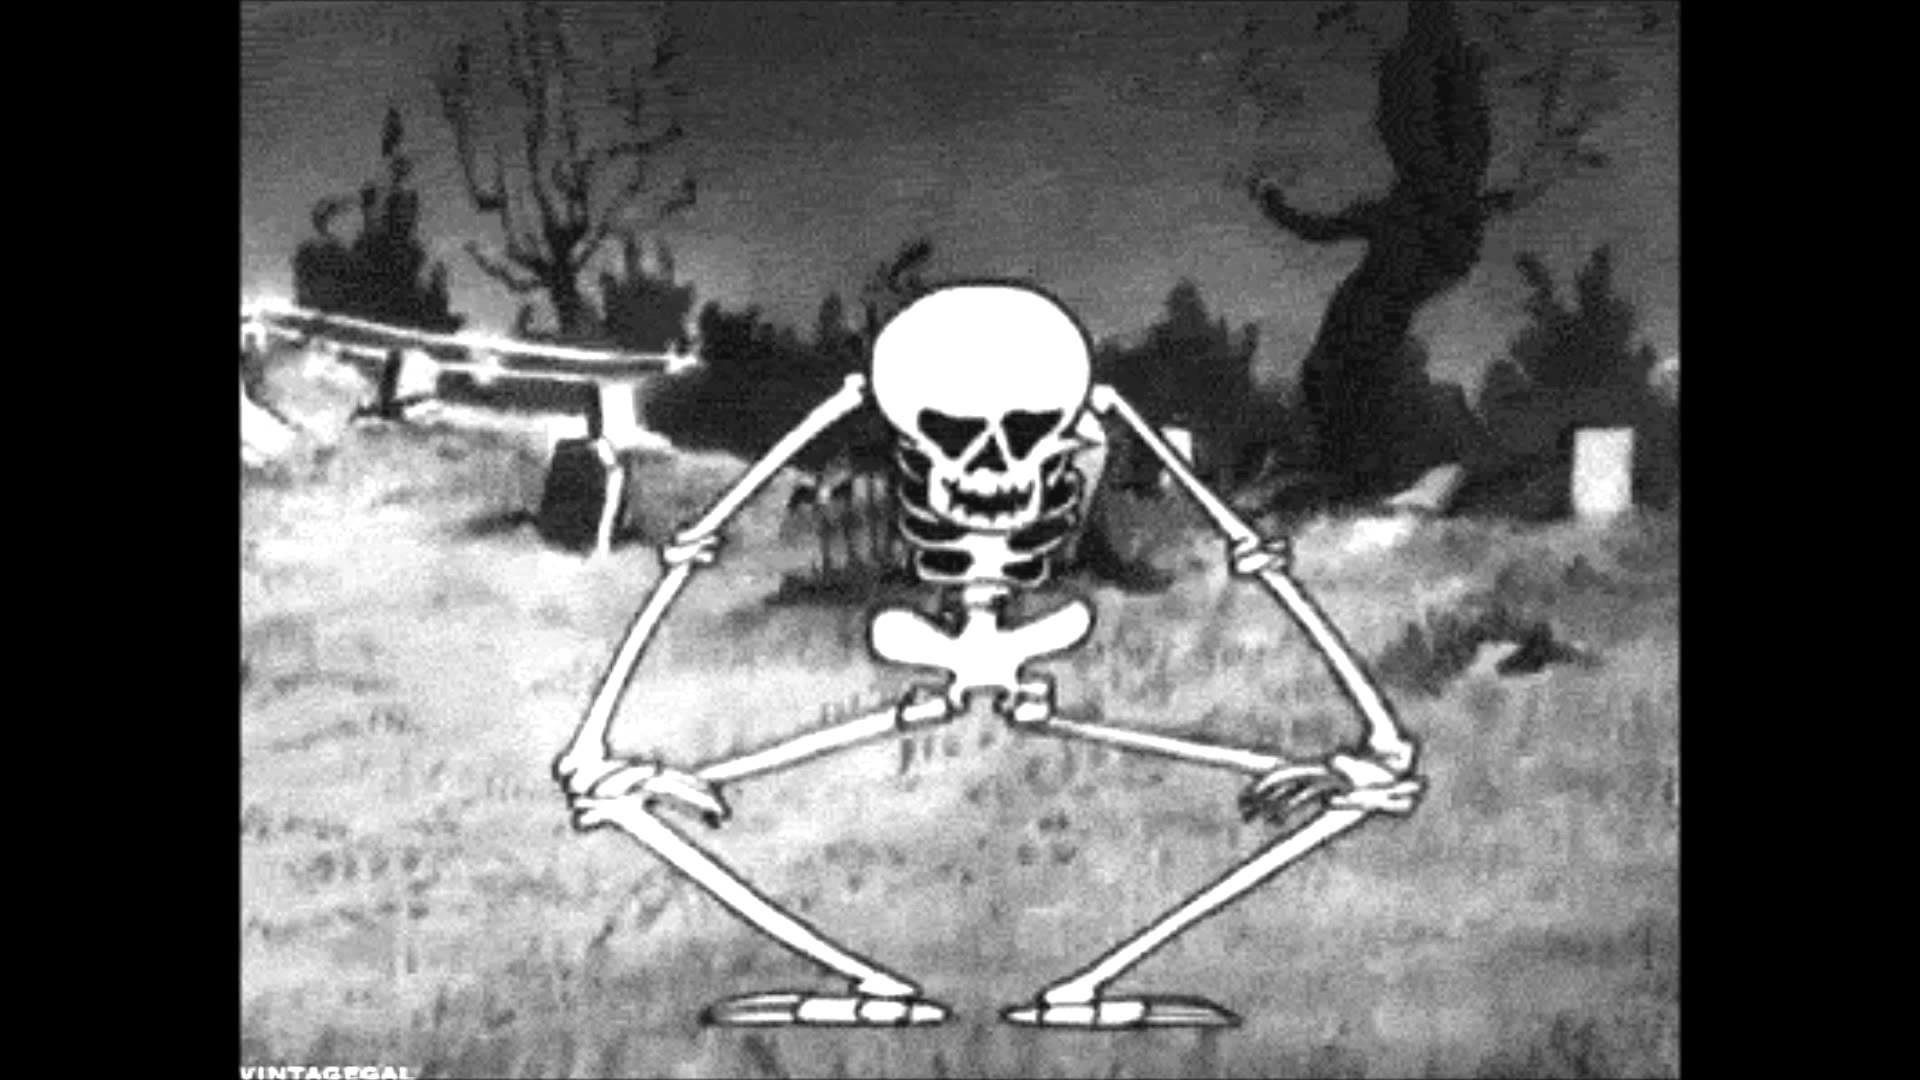 Scary skeleton wallpaper 66 images - Skeleton wallpaper ...